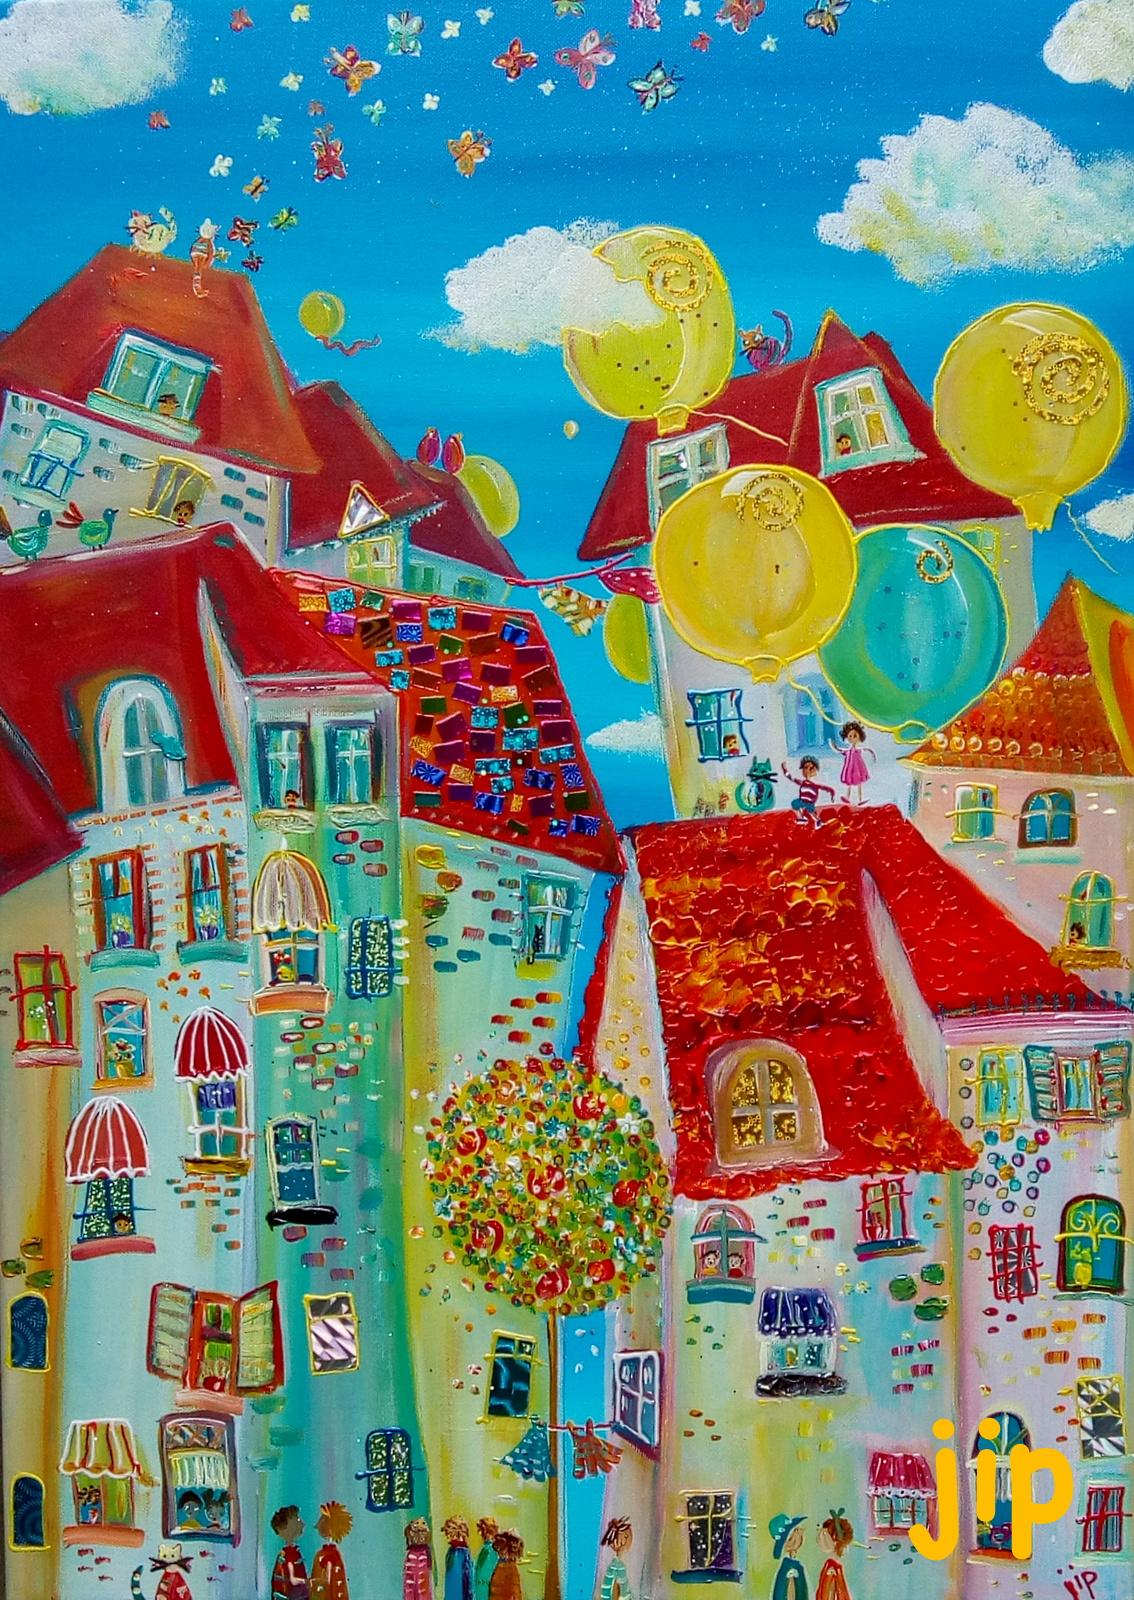 stad met ballonnen